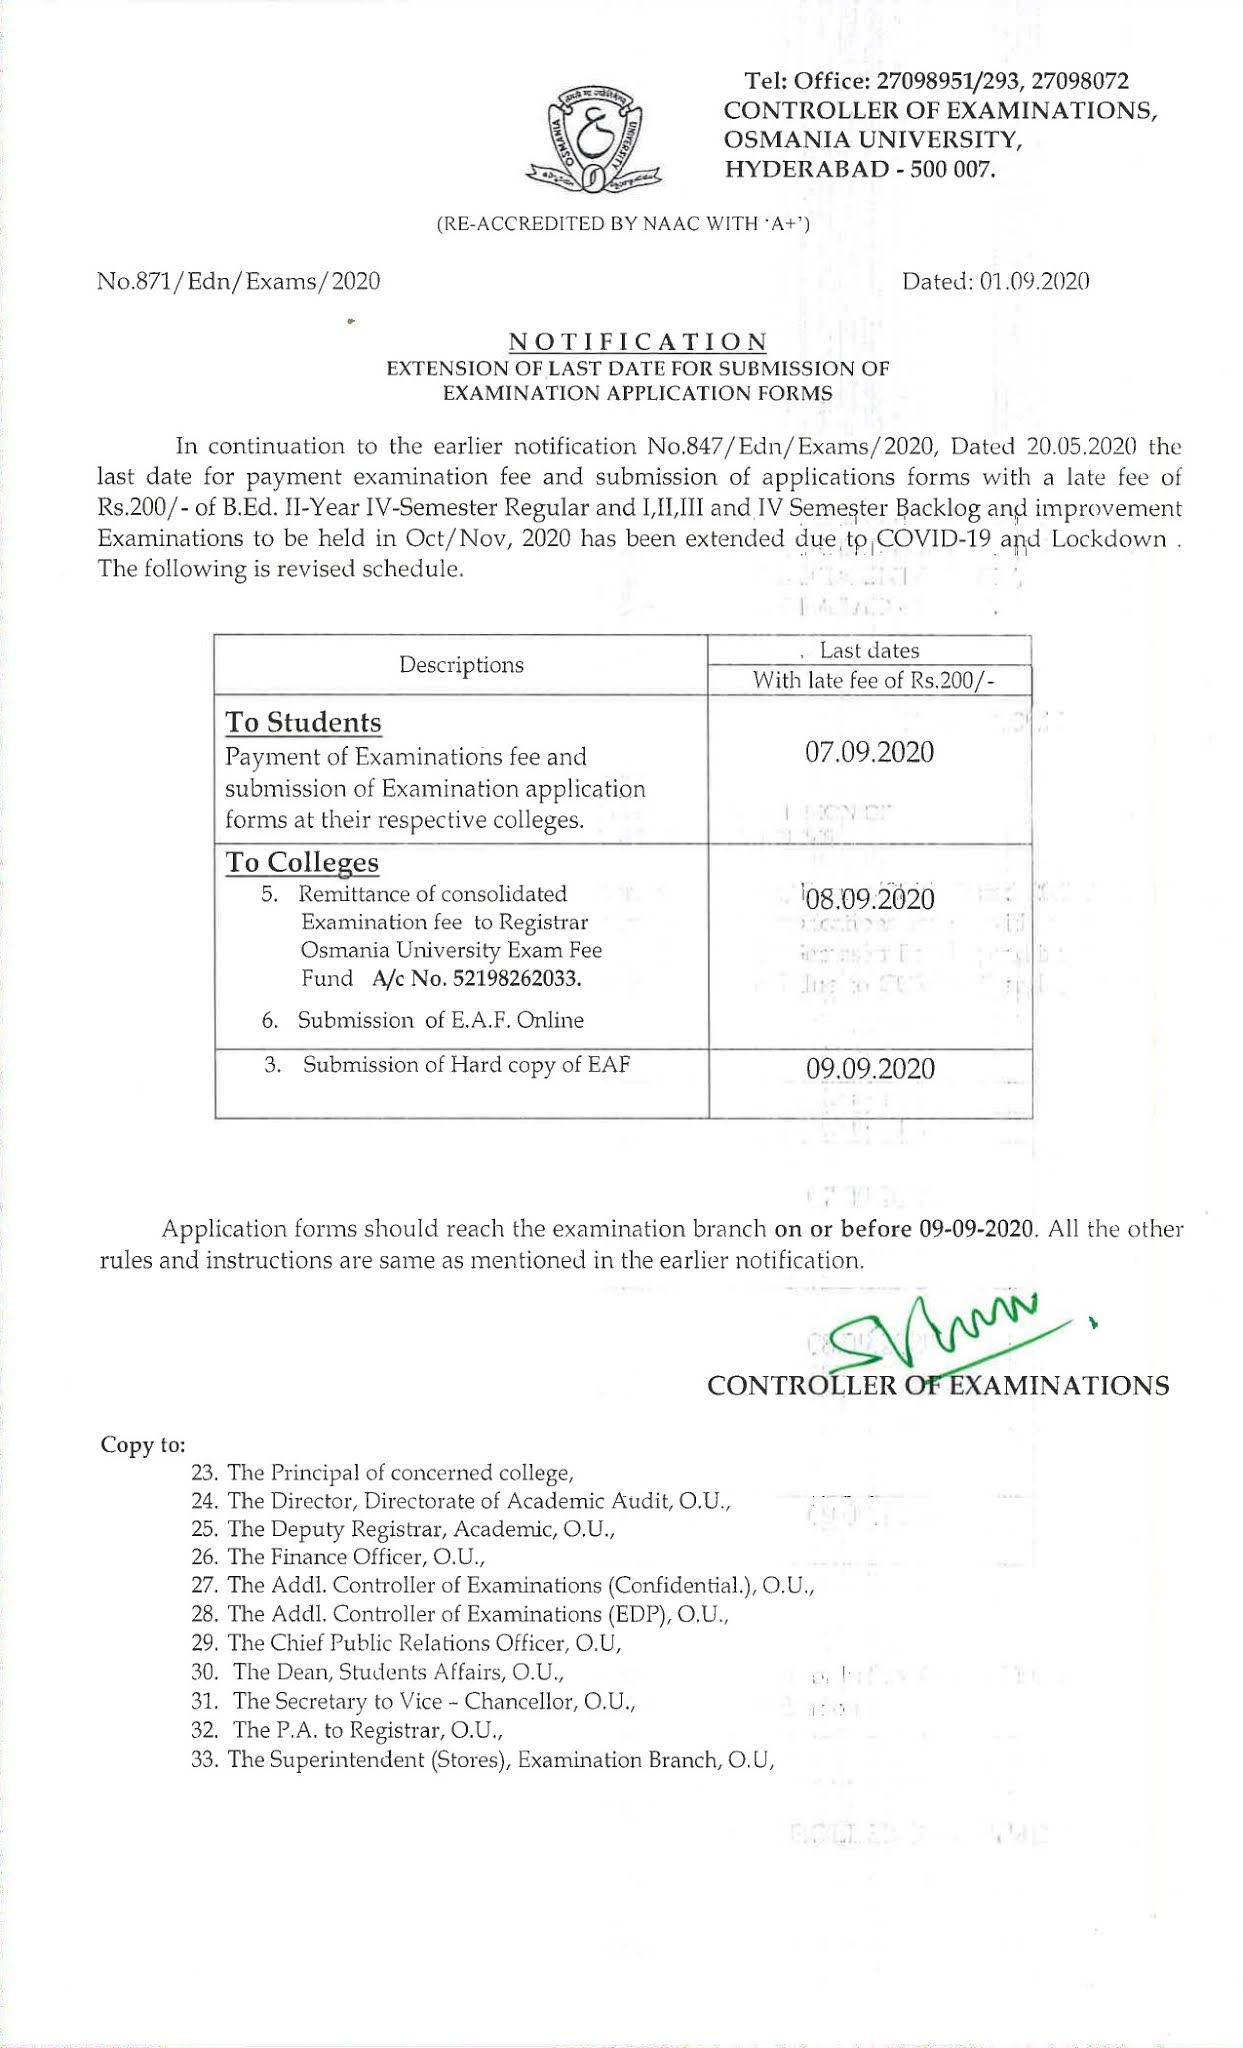 Osmania University B.Ed 1st to 4th Sem Sep 2020 Exam Fee Notification